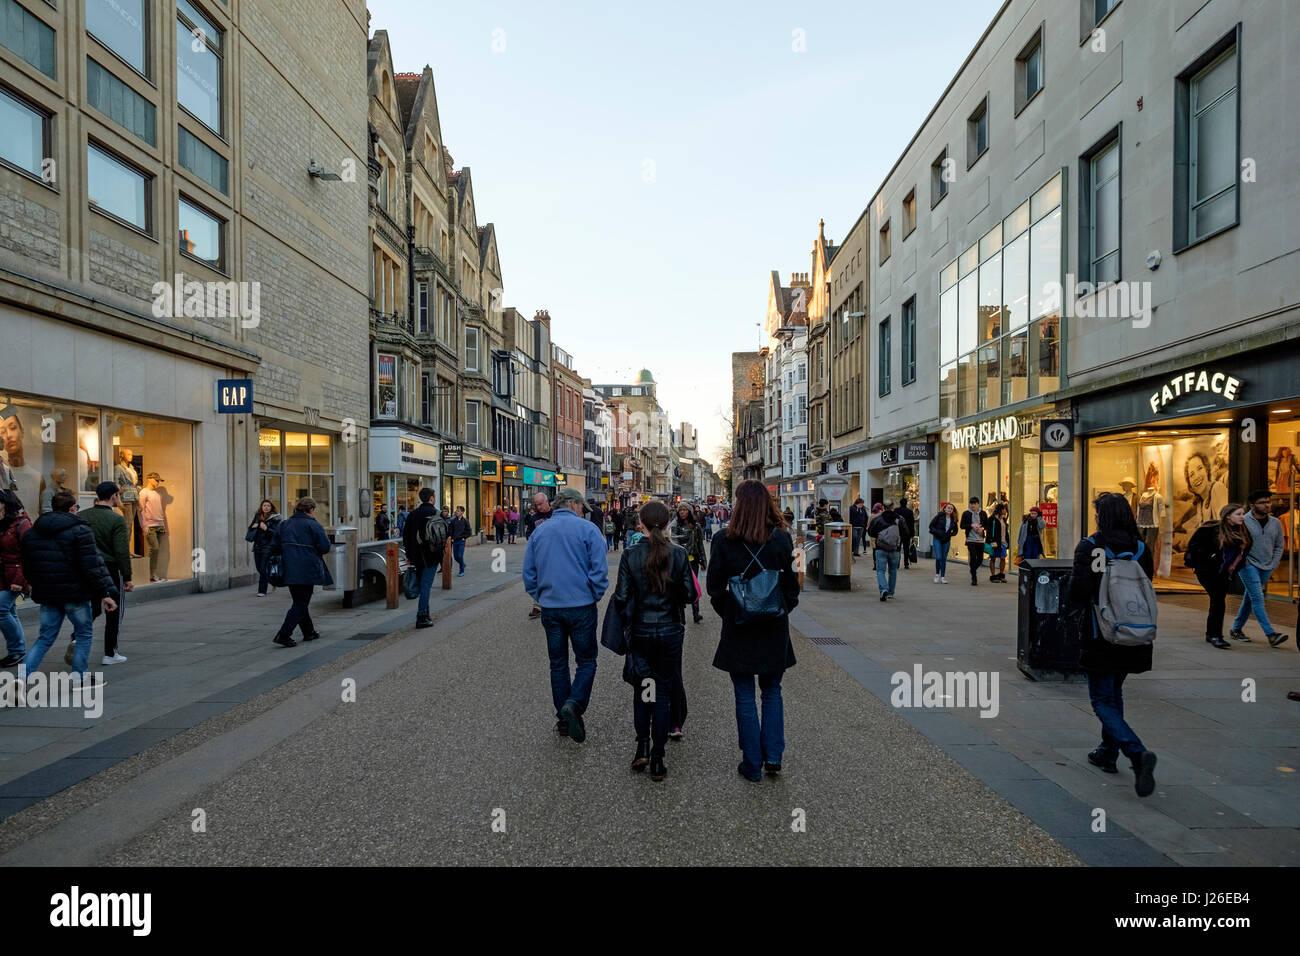 Cornmarket street in Oxford, Oxfordshire, England, United Kingdom - Stock Image